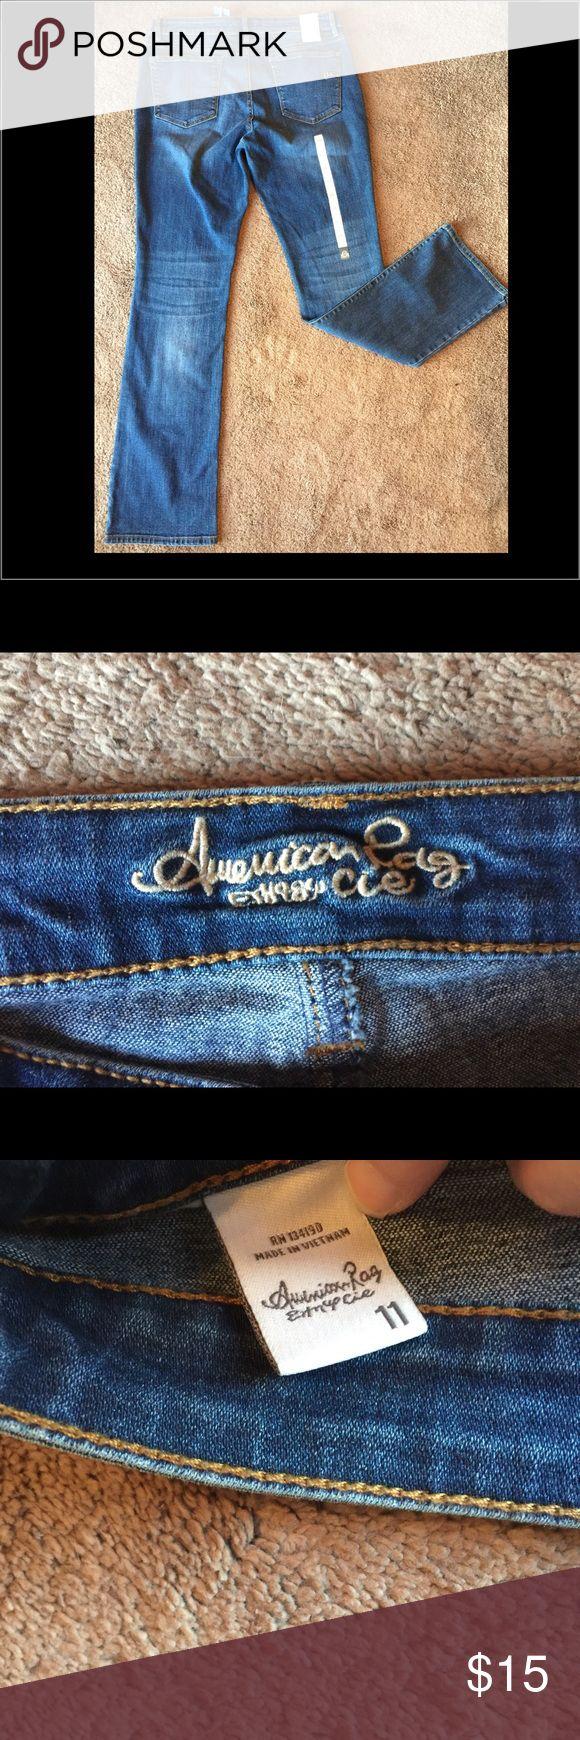 NWT American Rag Jeans NWT American Rag jeans. American Rag Jeans